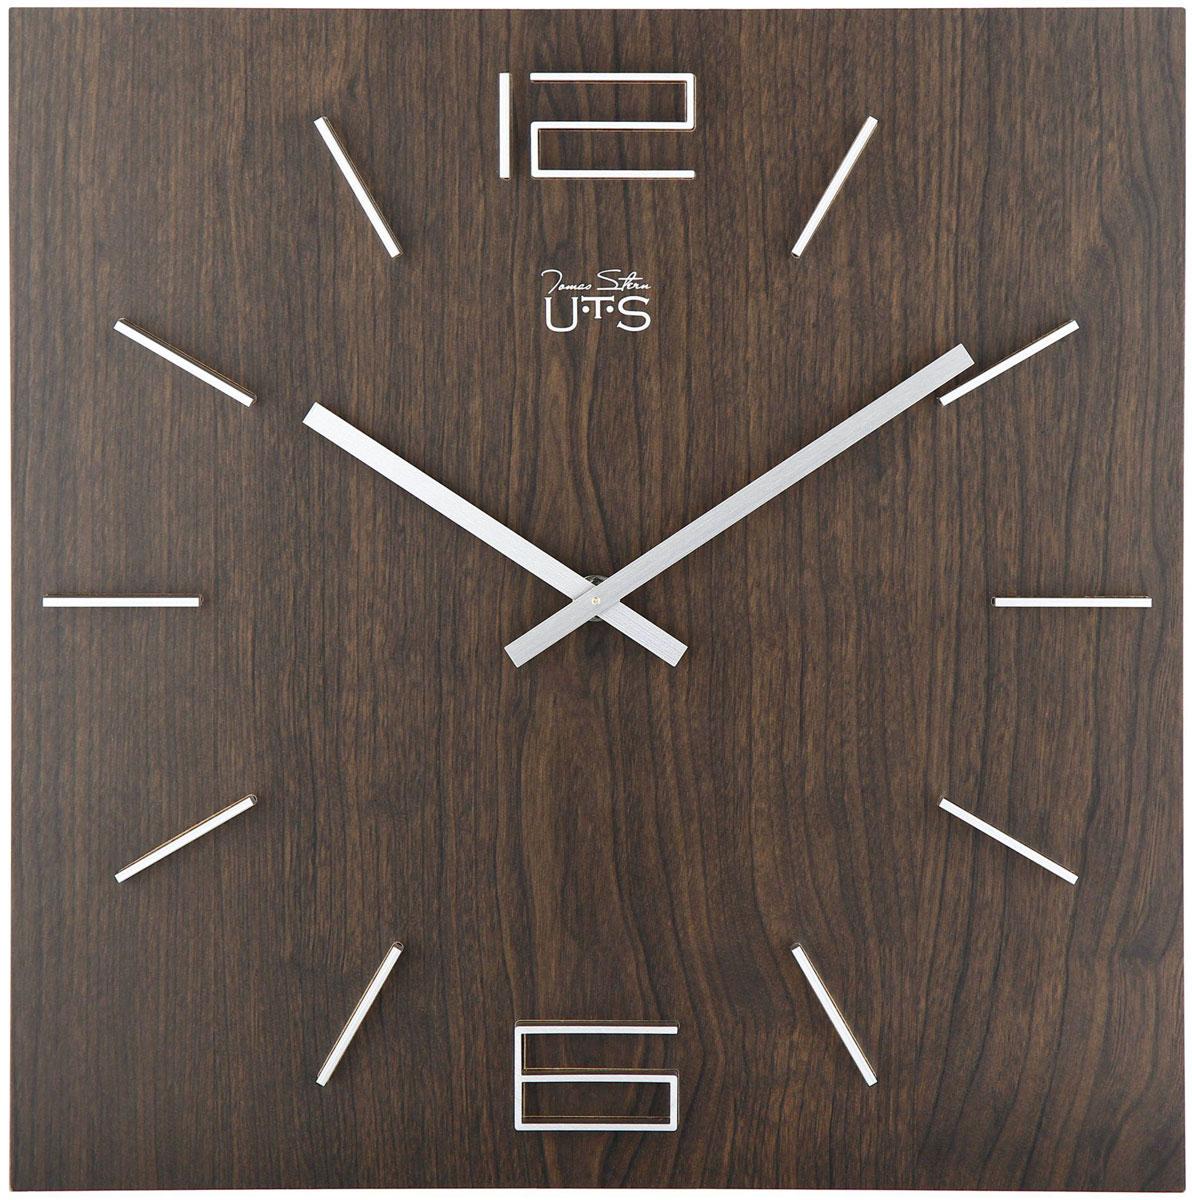 Настенные часы Tomas Stern 4037B_TS techlink ev160w корпус из мдф орехового цвета